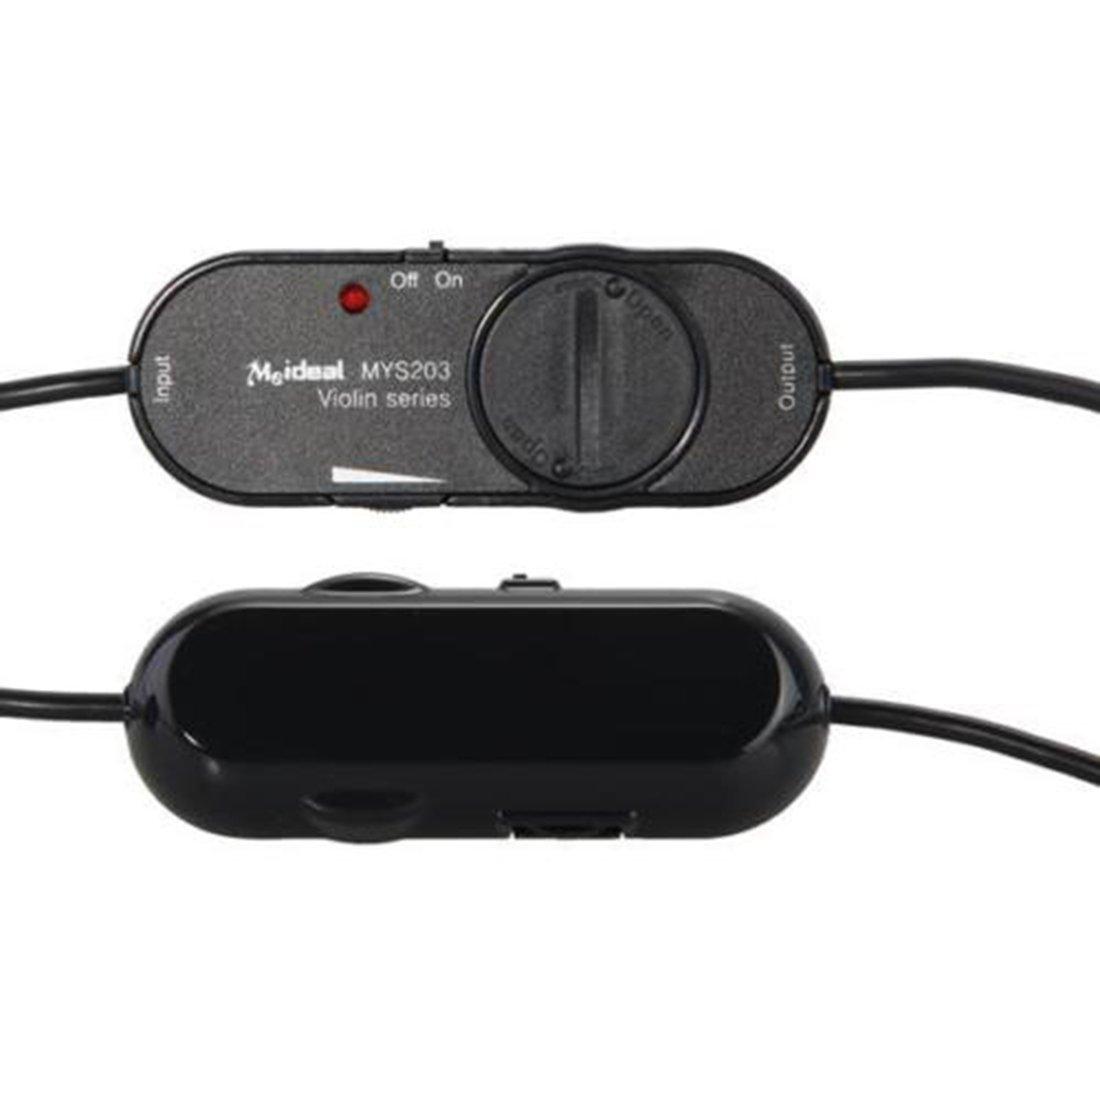 MYS203 Microphone Guitar Pickup for Guitar Violin Banjo Mandolin Ukulele Guitar Parts & Accessories